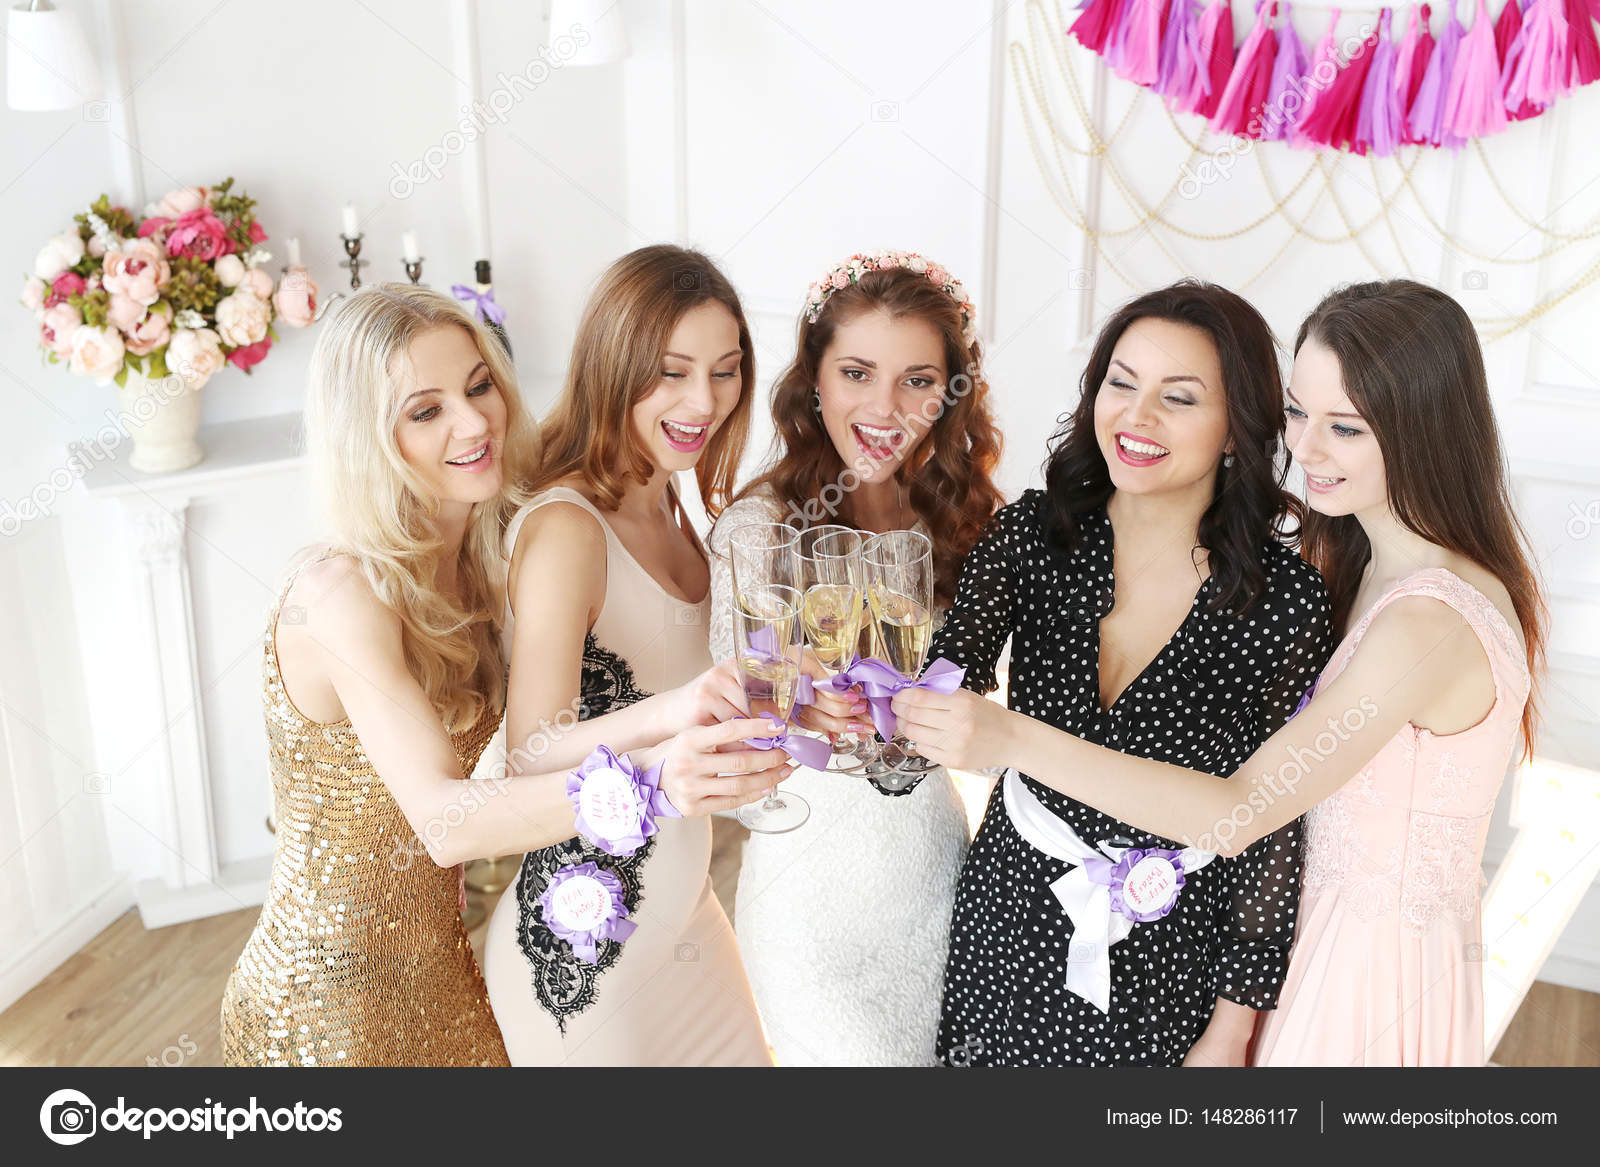 Solteras posando sexi buscan pareja [PUNIQRANDLINE-(au-dating-names.txt) 48